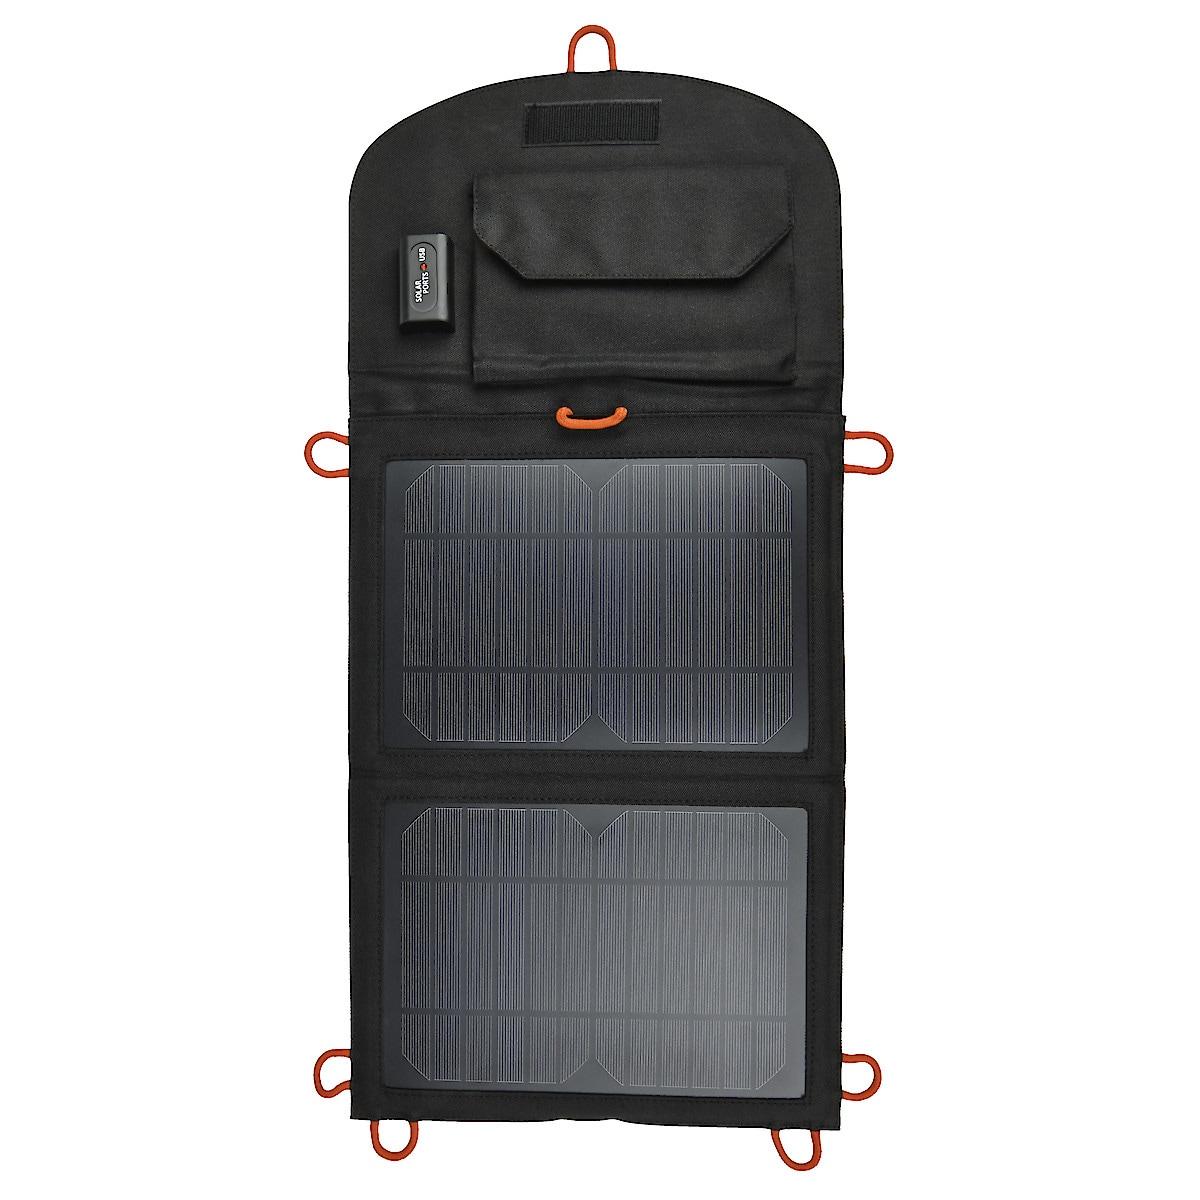 Solcellsladdare med USB 10 W Exibel